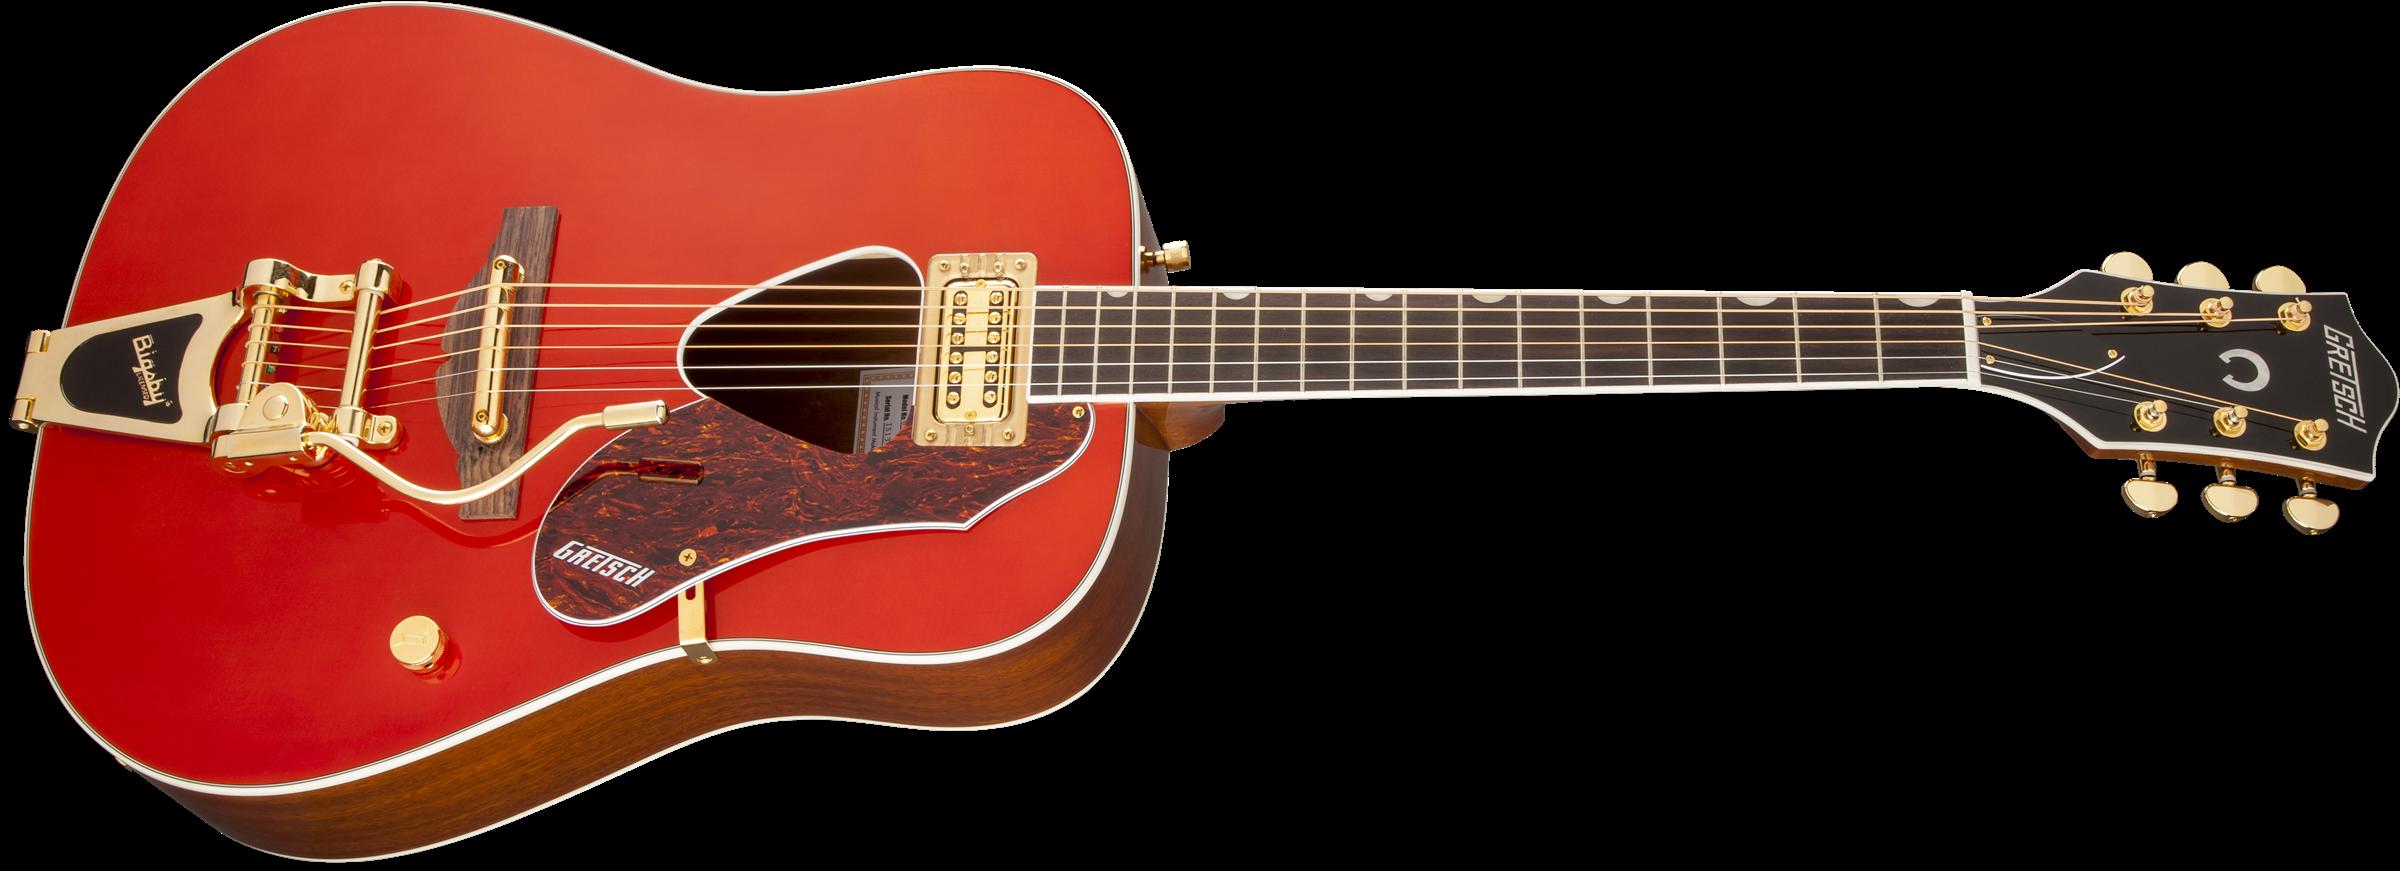 Gretsch Acoustic Guitars >> Acoustic Guitar G5034tft Rancher Fideli Tron Pickup Bigsby